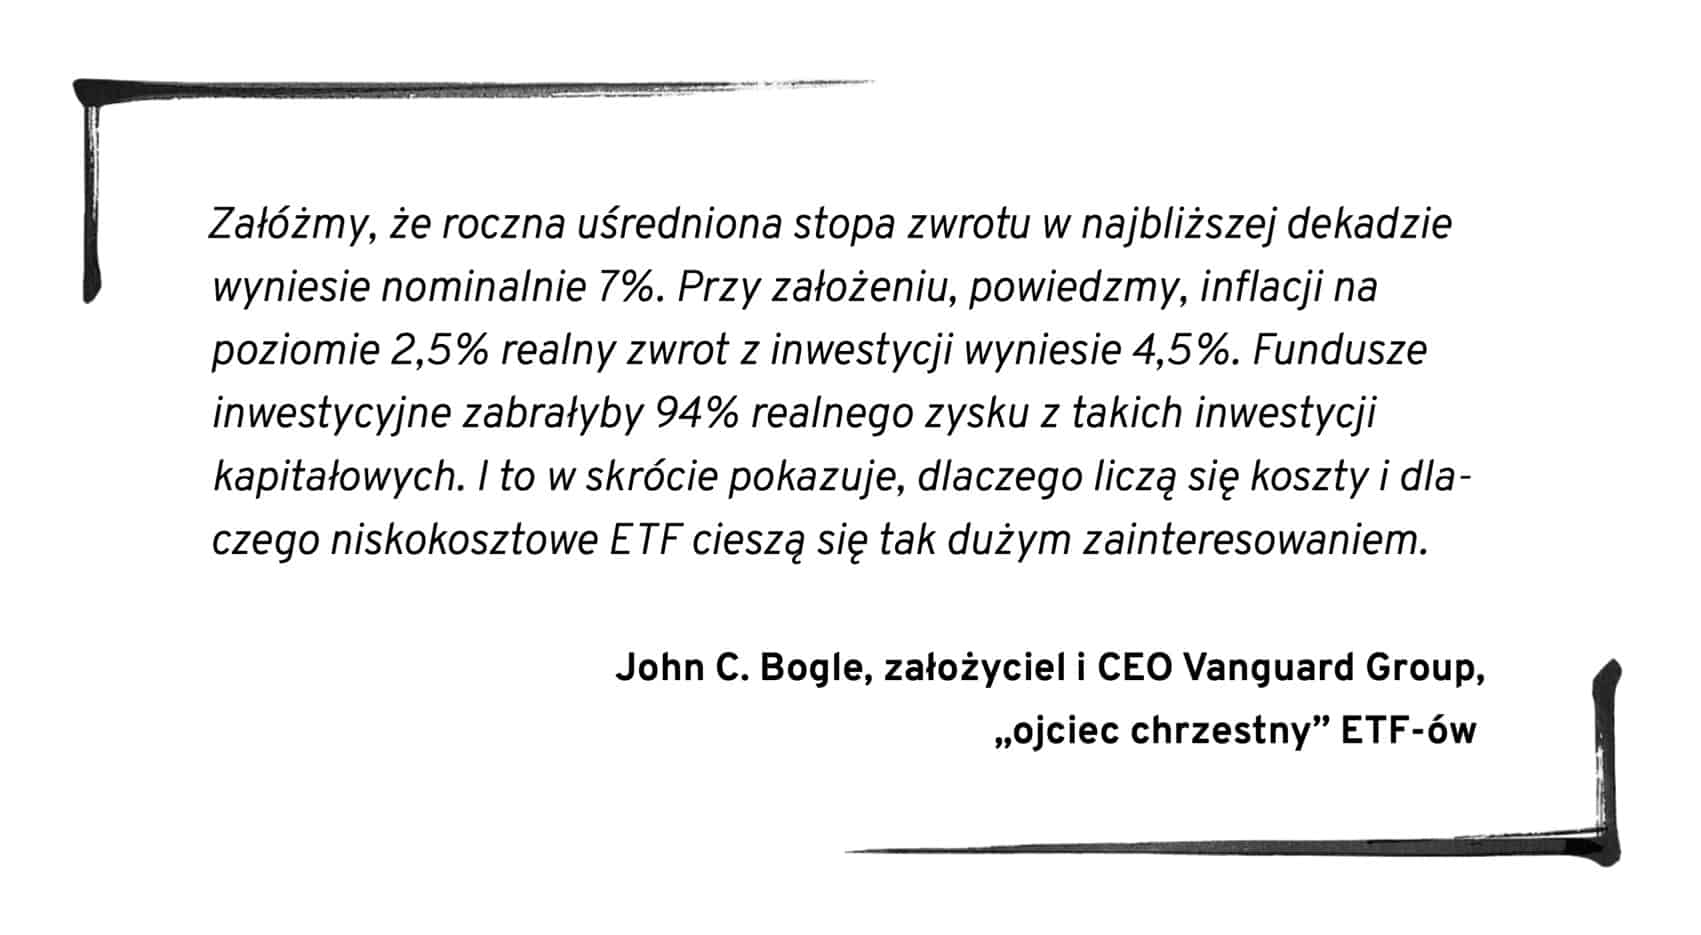 jak inwestować John C Bogle